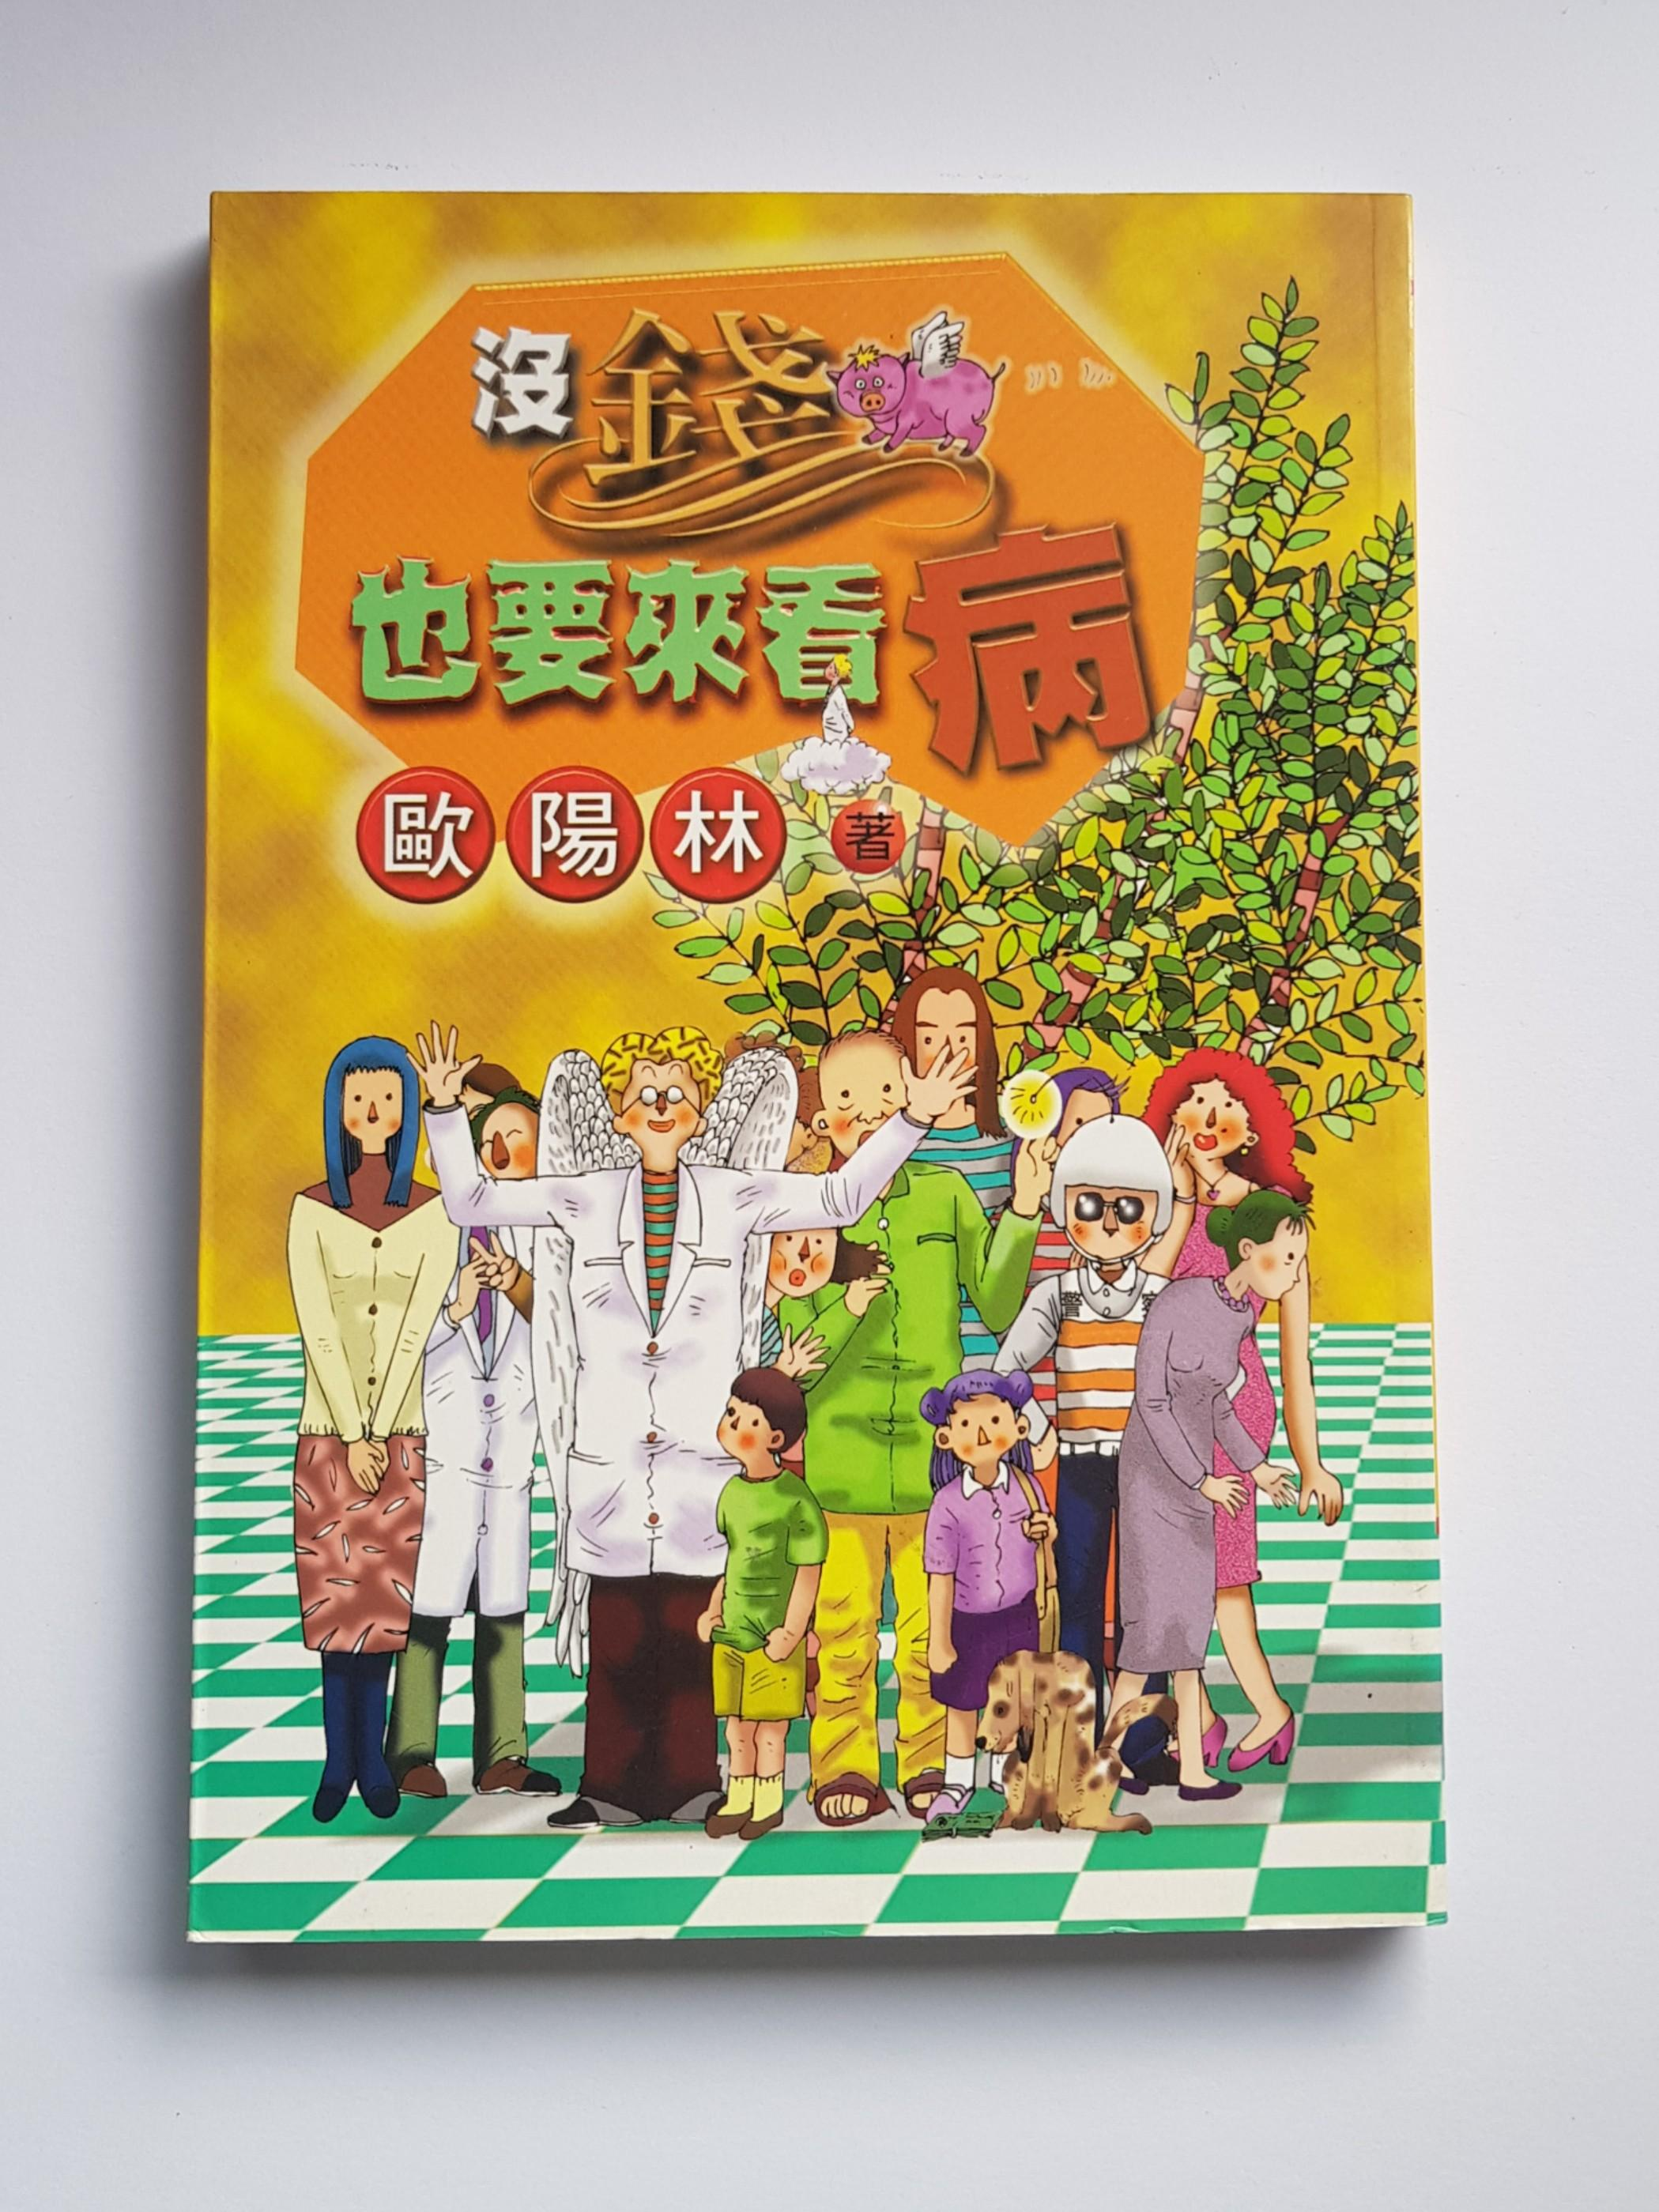 Chinese Book - motivation story 名人的小故事